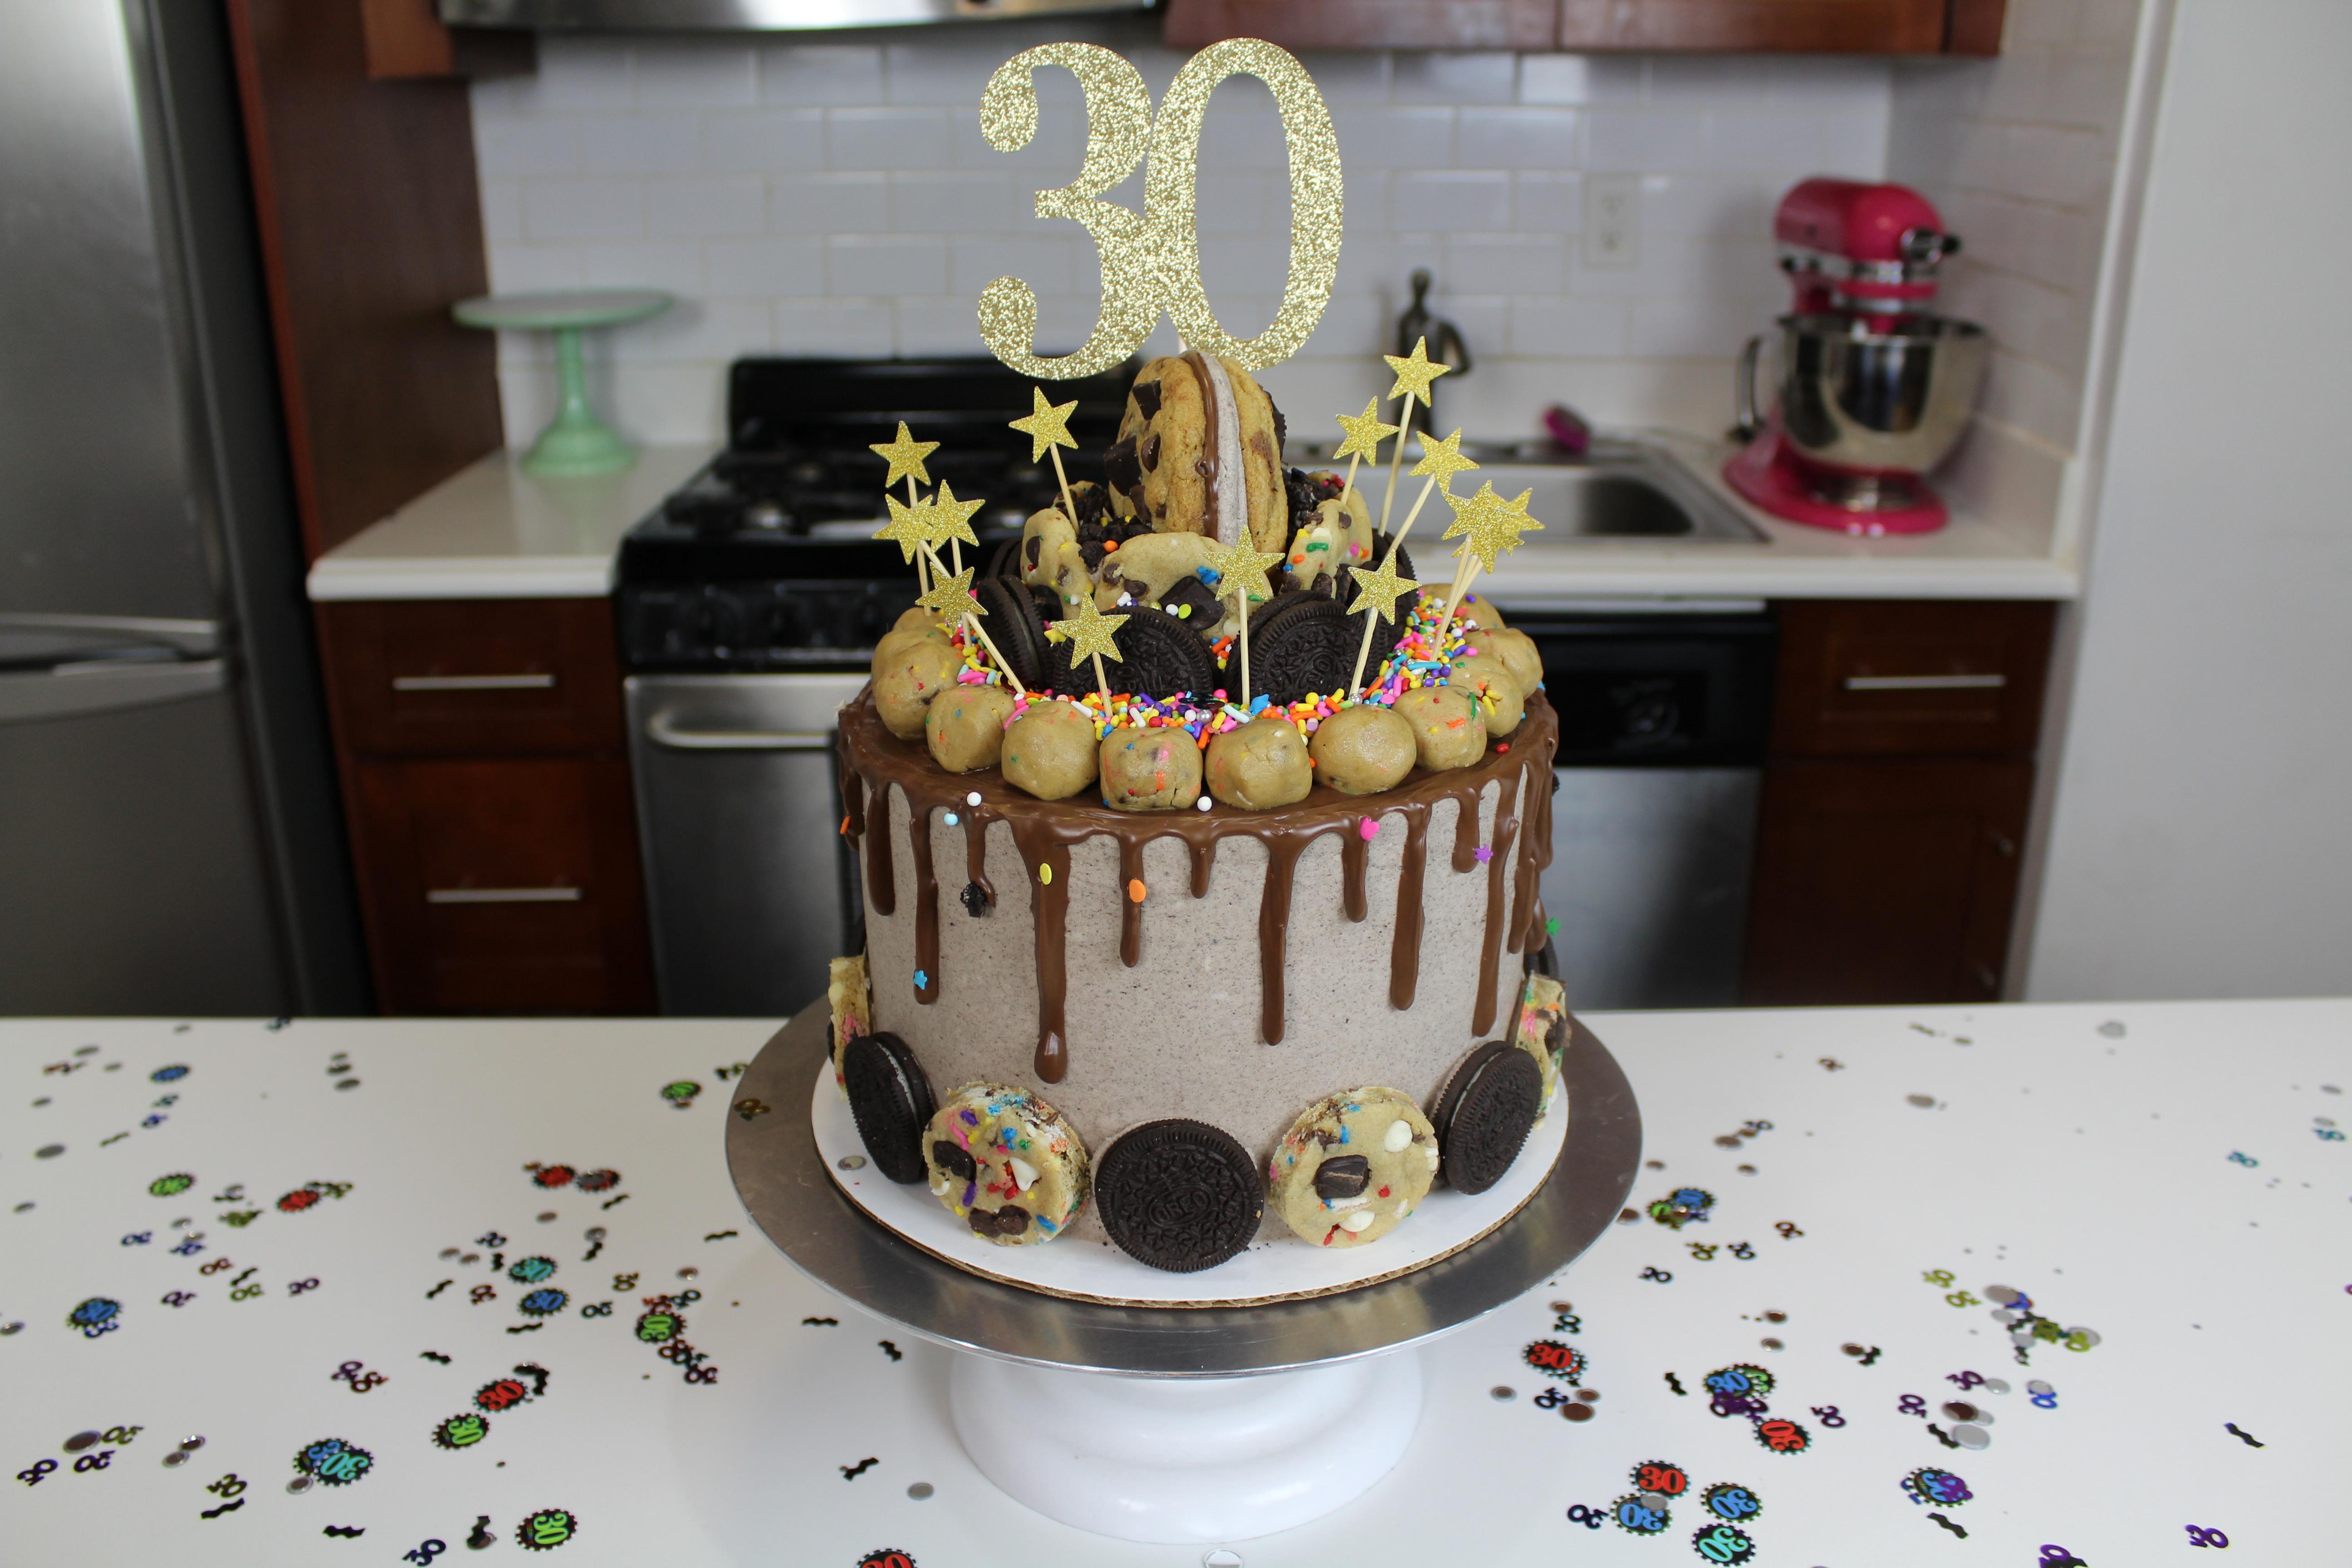 Chelsweets Nutella Oreo Birthday Cake Chelsey White